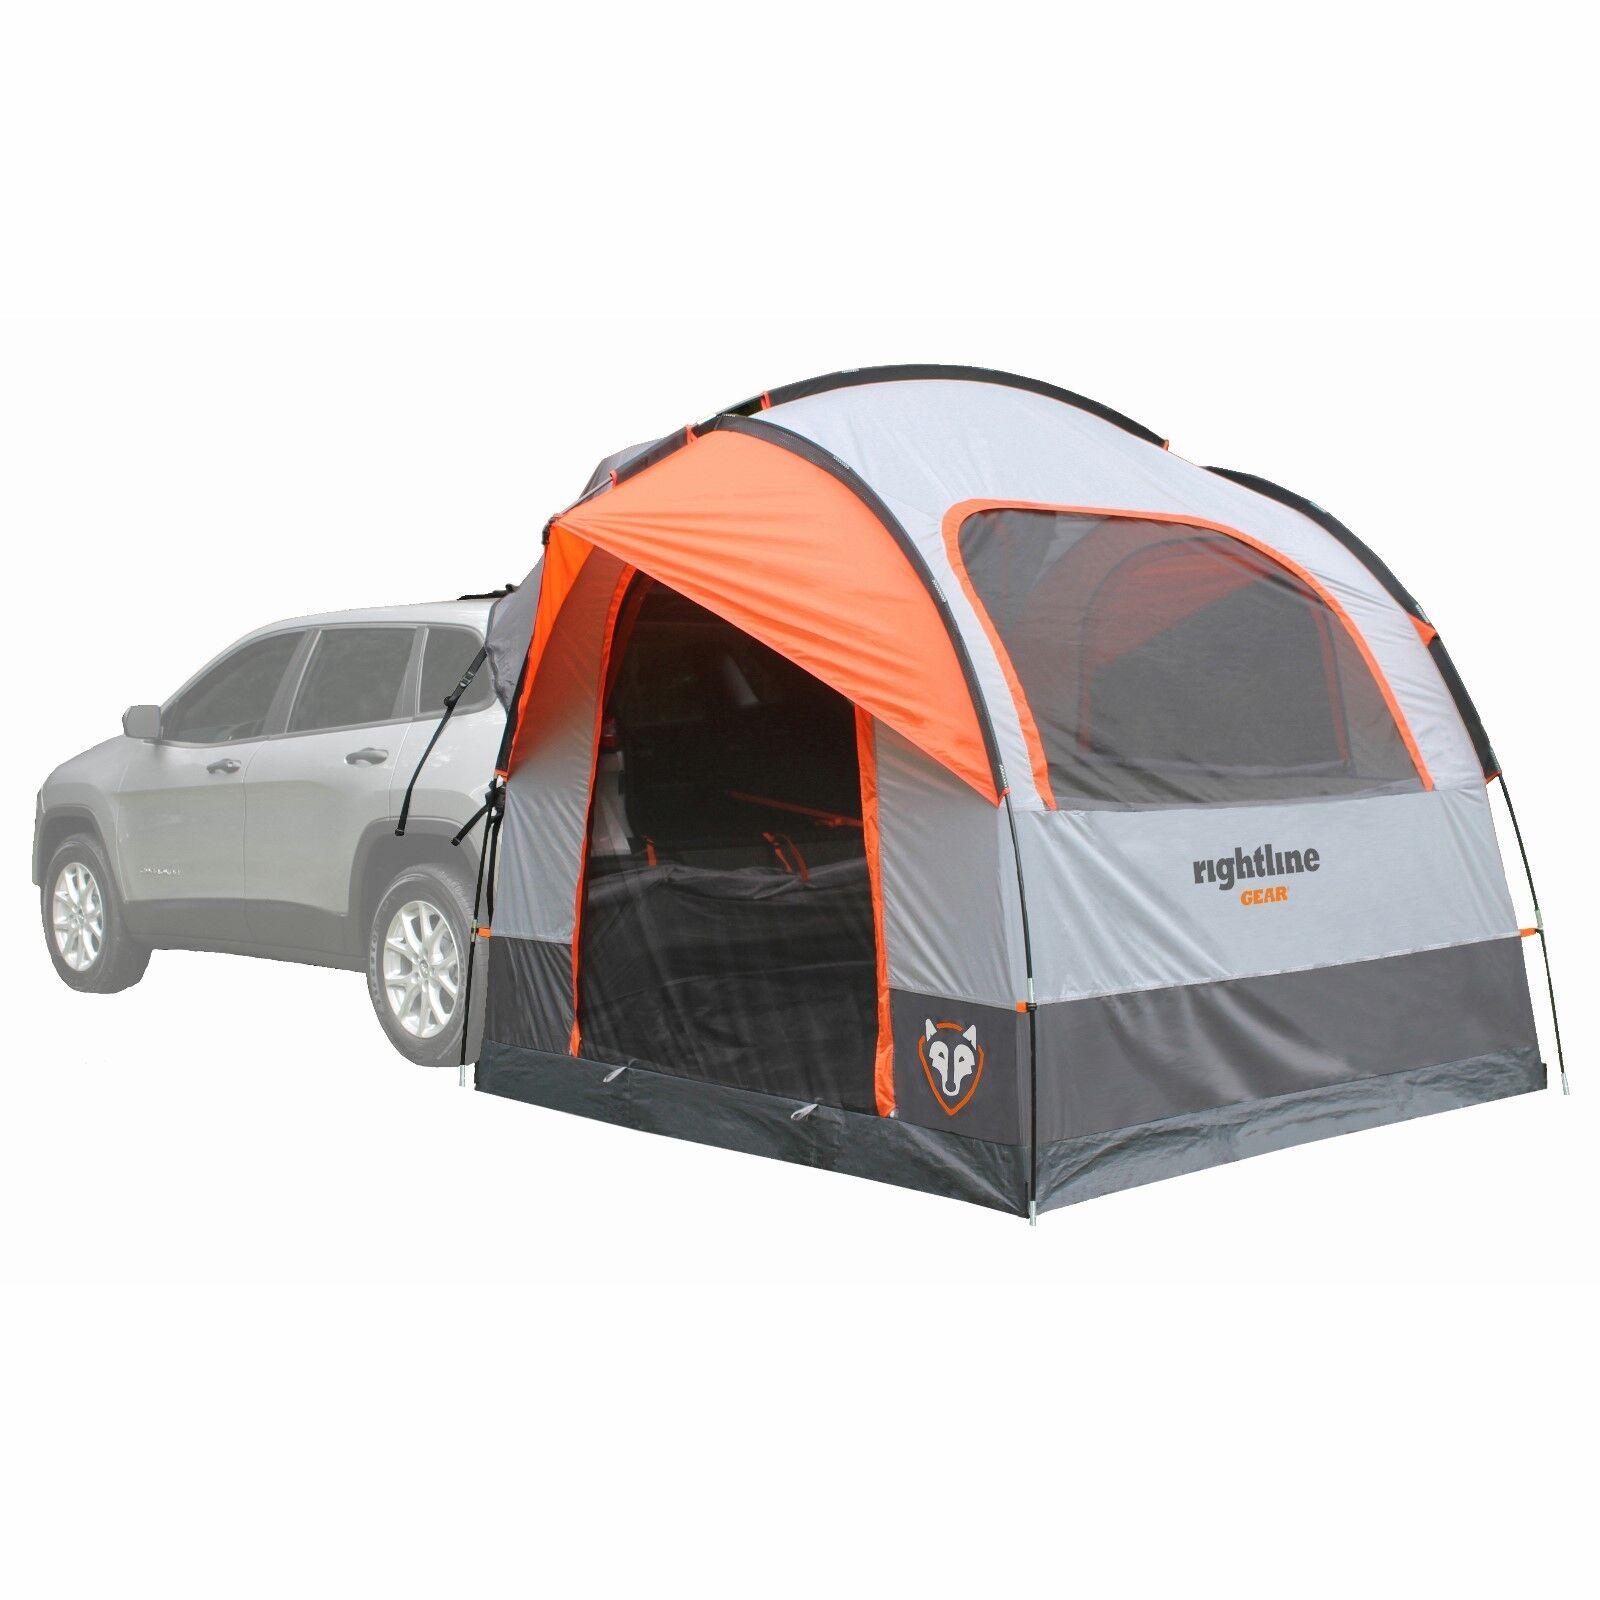 Rightline Gear 110907 SUV Tent, orange B00NGJEN5K